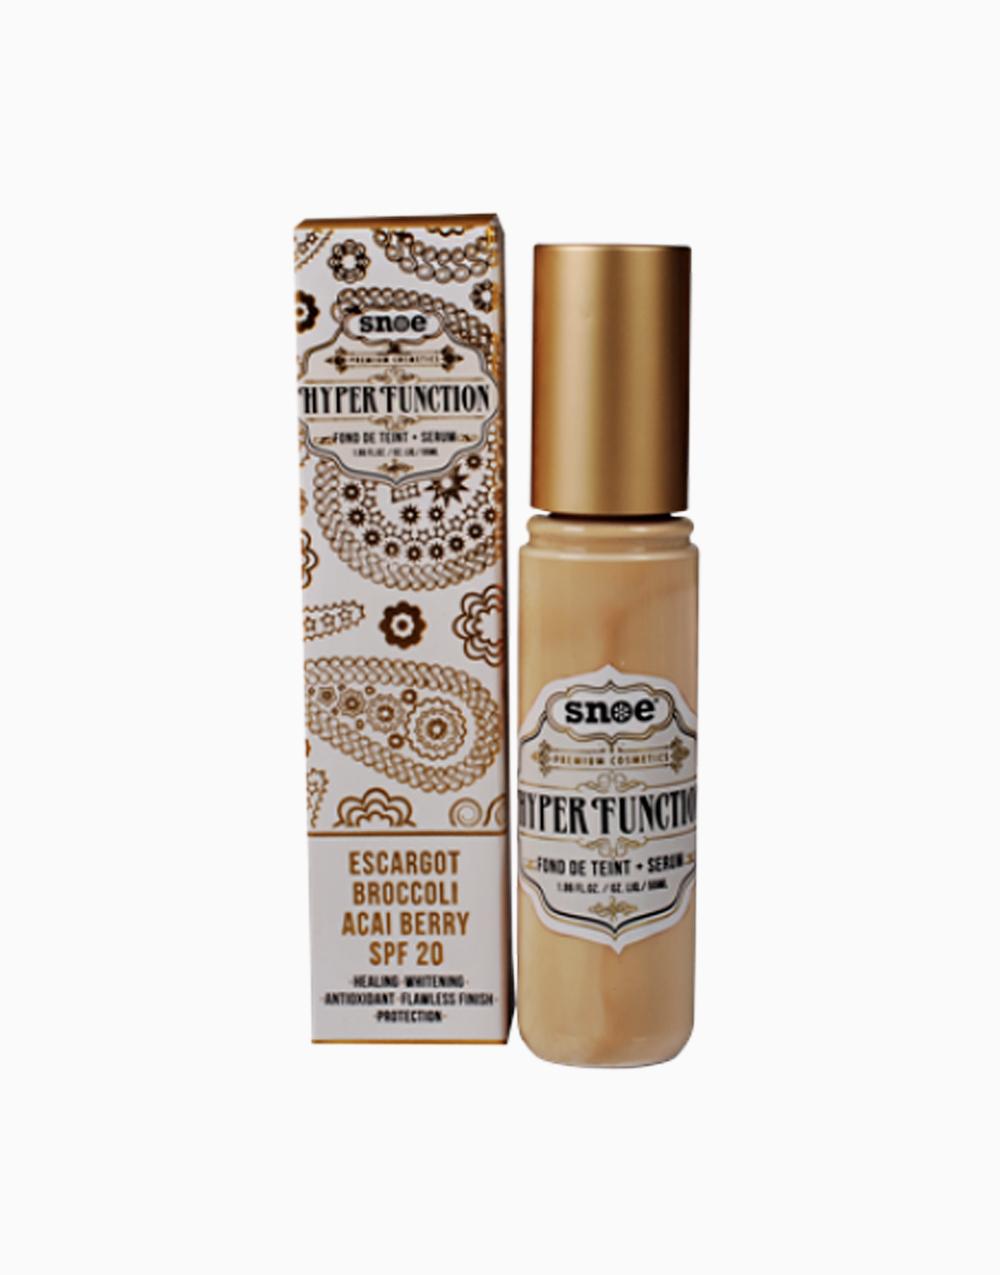 Hyperfunction Fond De Teint + Serum In X0 Vanilla Crème by Snoe Beauty